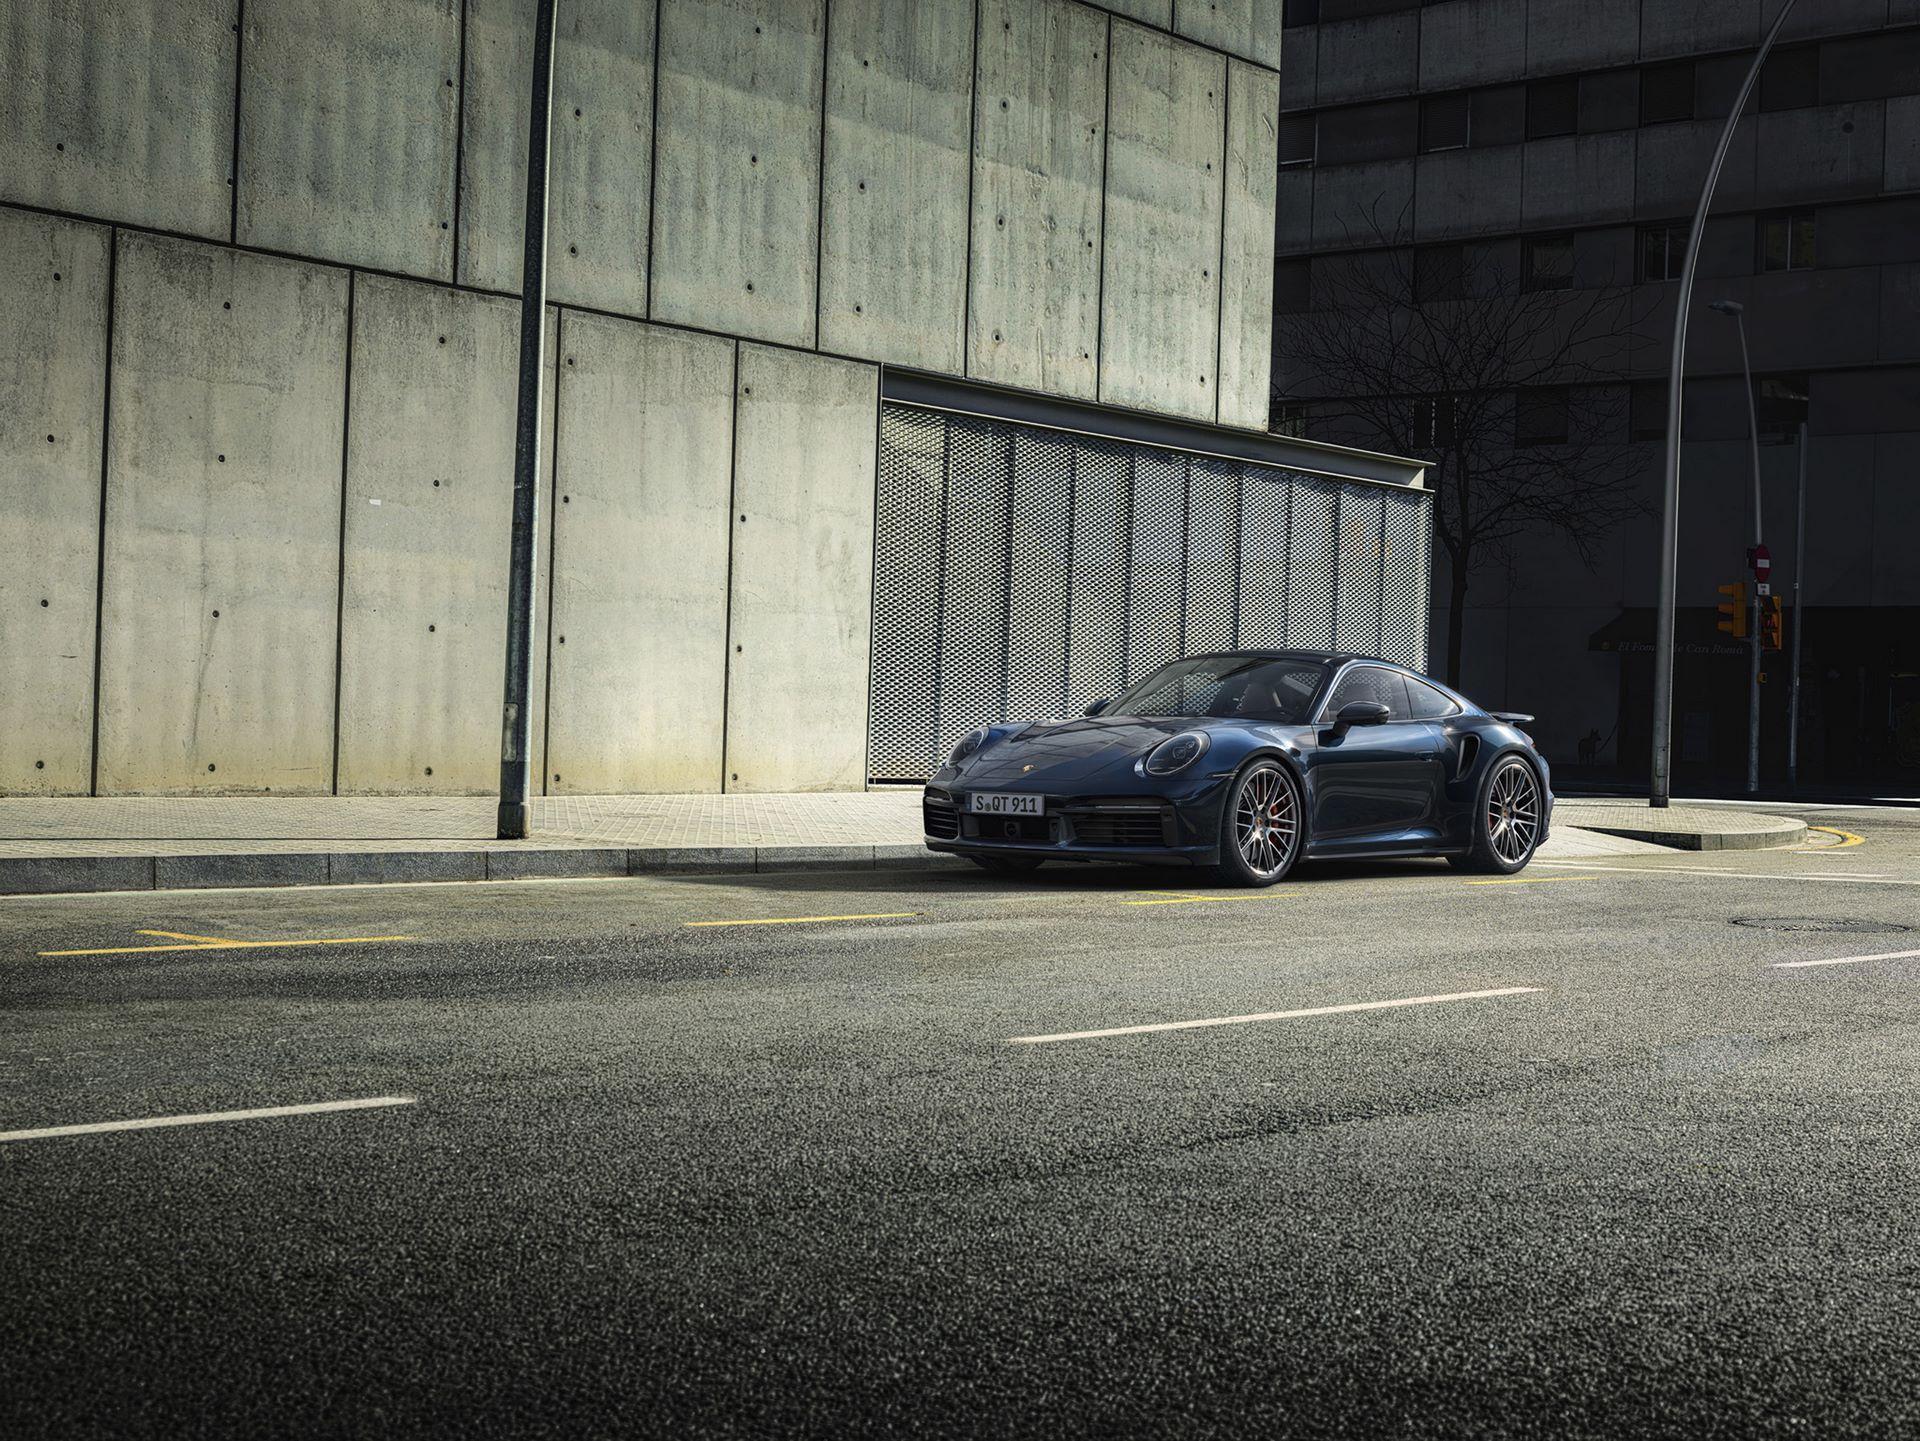 Porsche-911-Turbo-2020-1